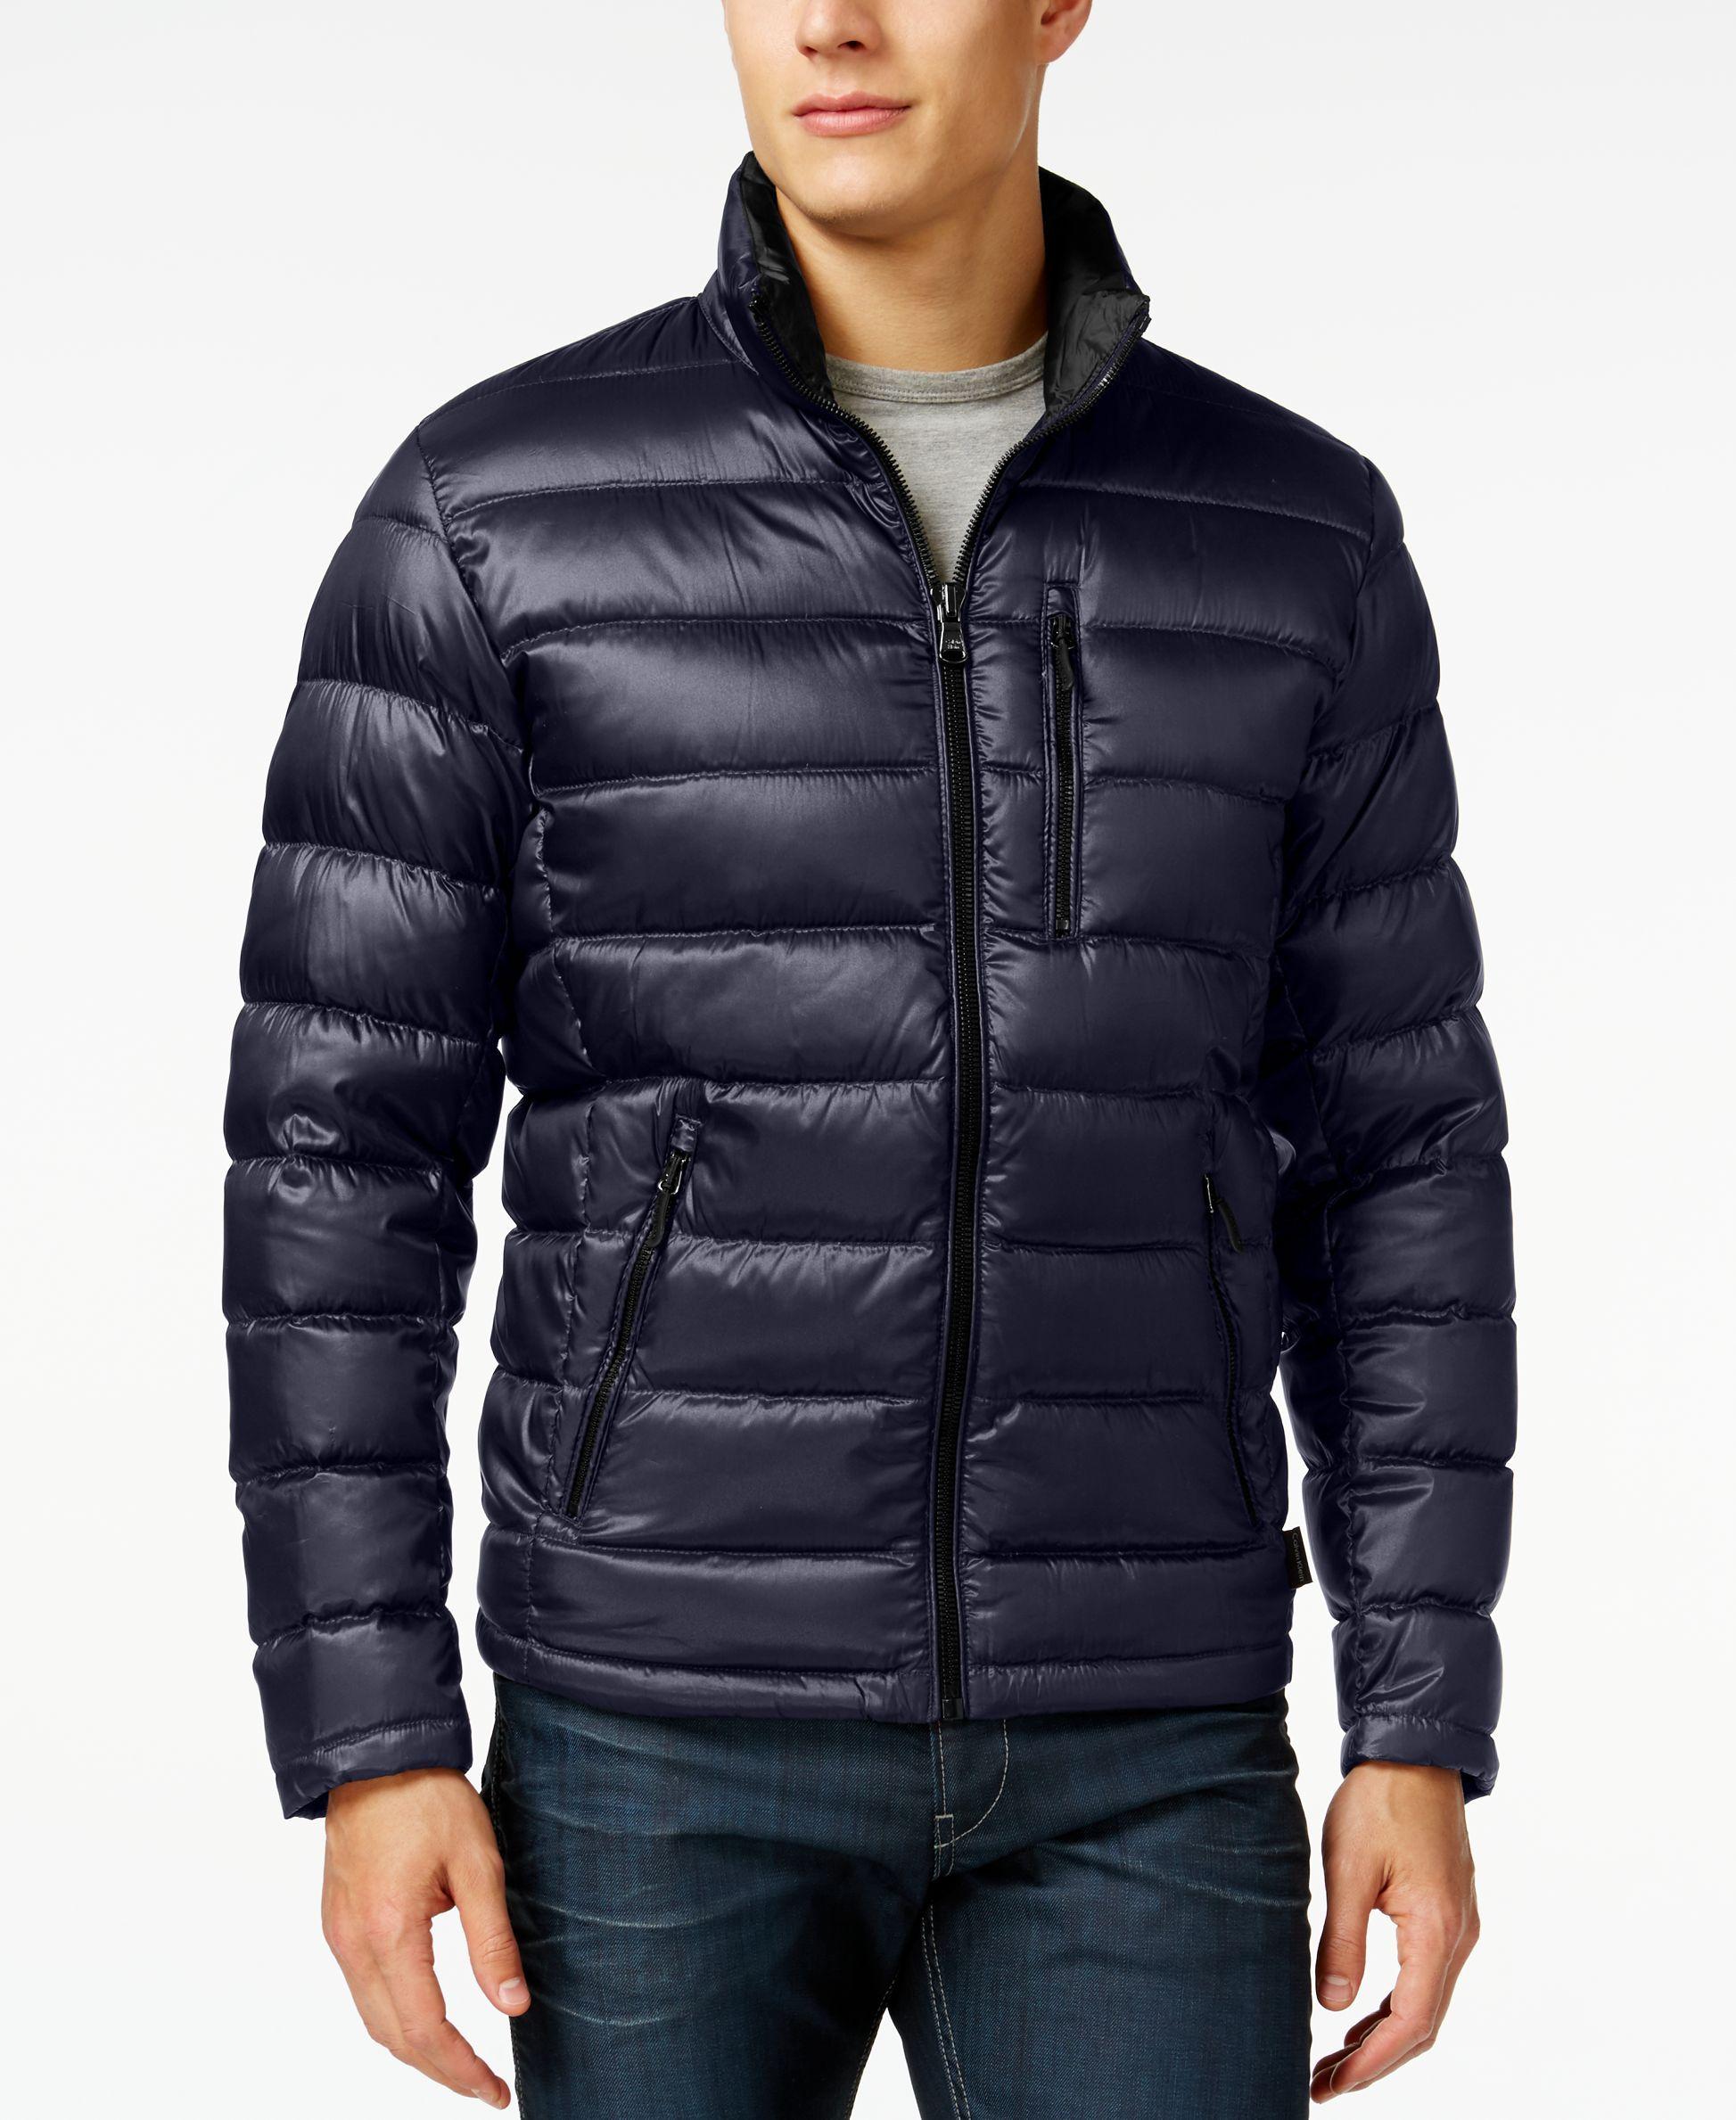 76884e404cd Calvin Klein Men's Packable Down Jacket | jackets | Jackets, Calvin ...